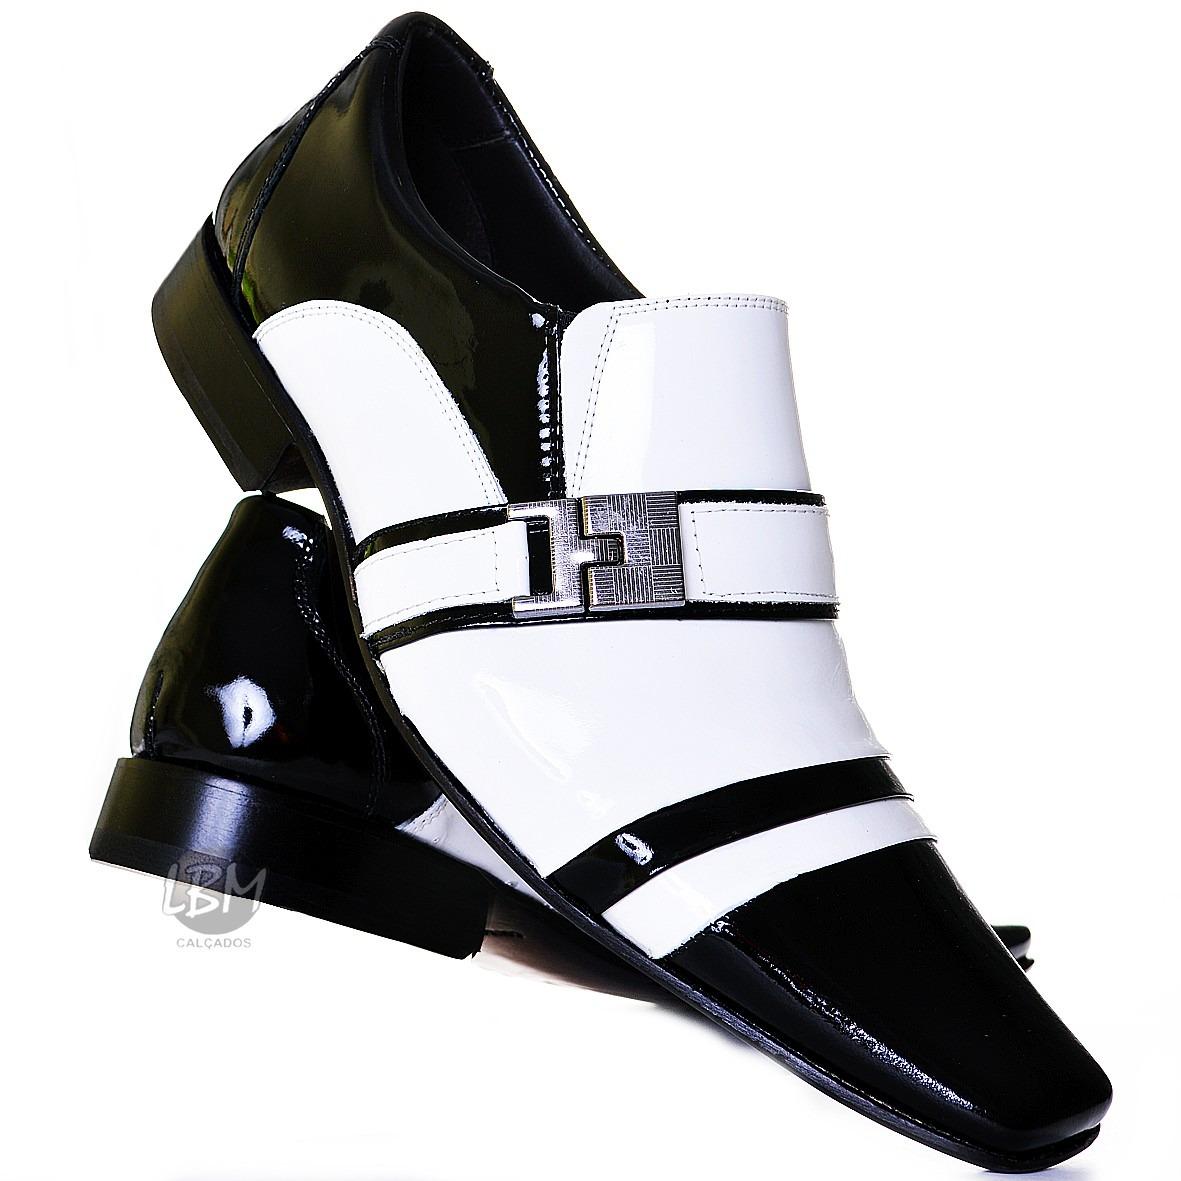 80d0c3fa21 sapato social masculino em couro verniz preto e branco luxo. Carregando  zoom.